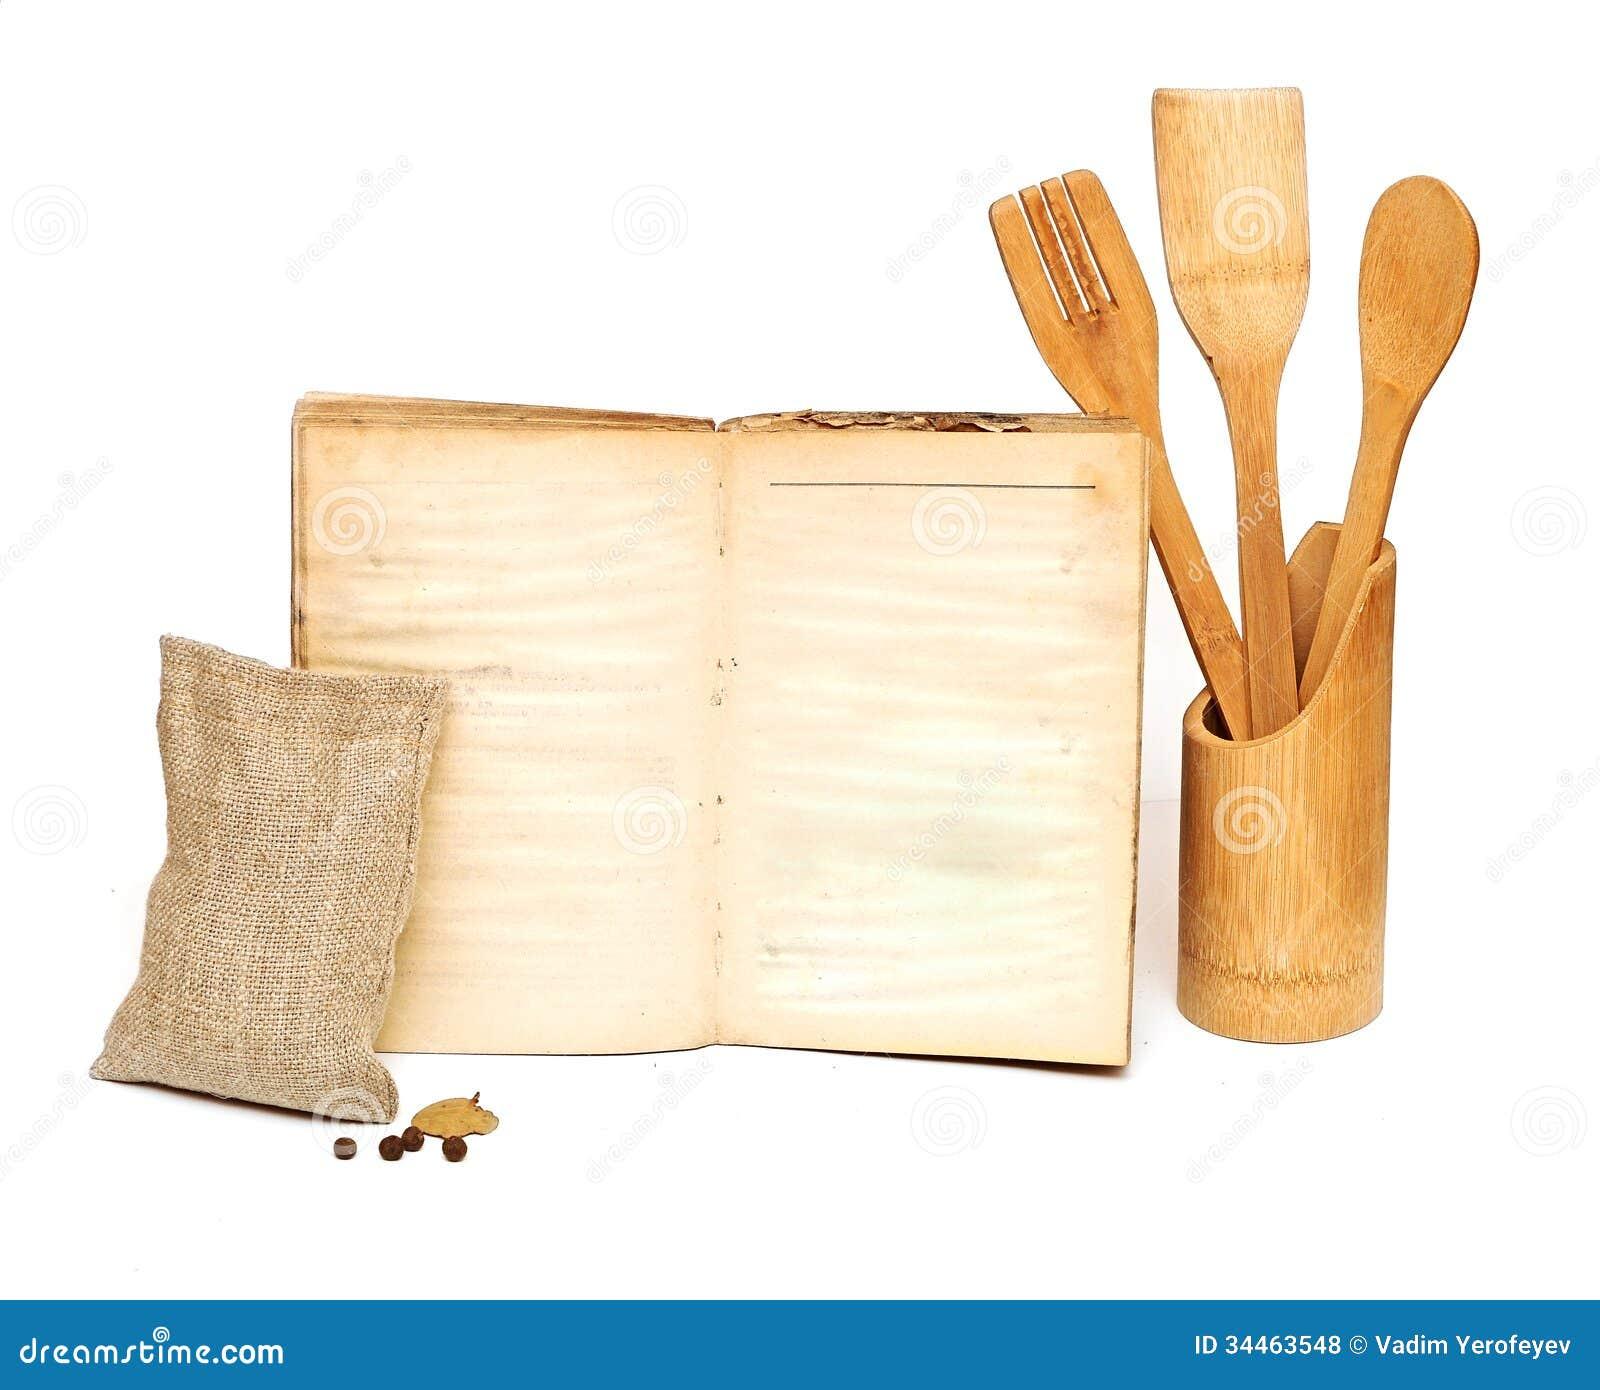 Kitchen Utensils Background: Wooden Cooking Utensils Royalty Free Stock Photos